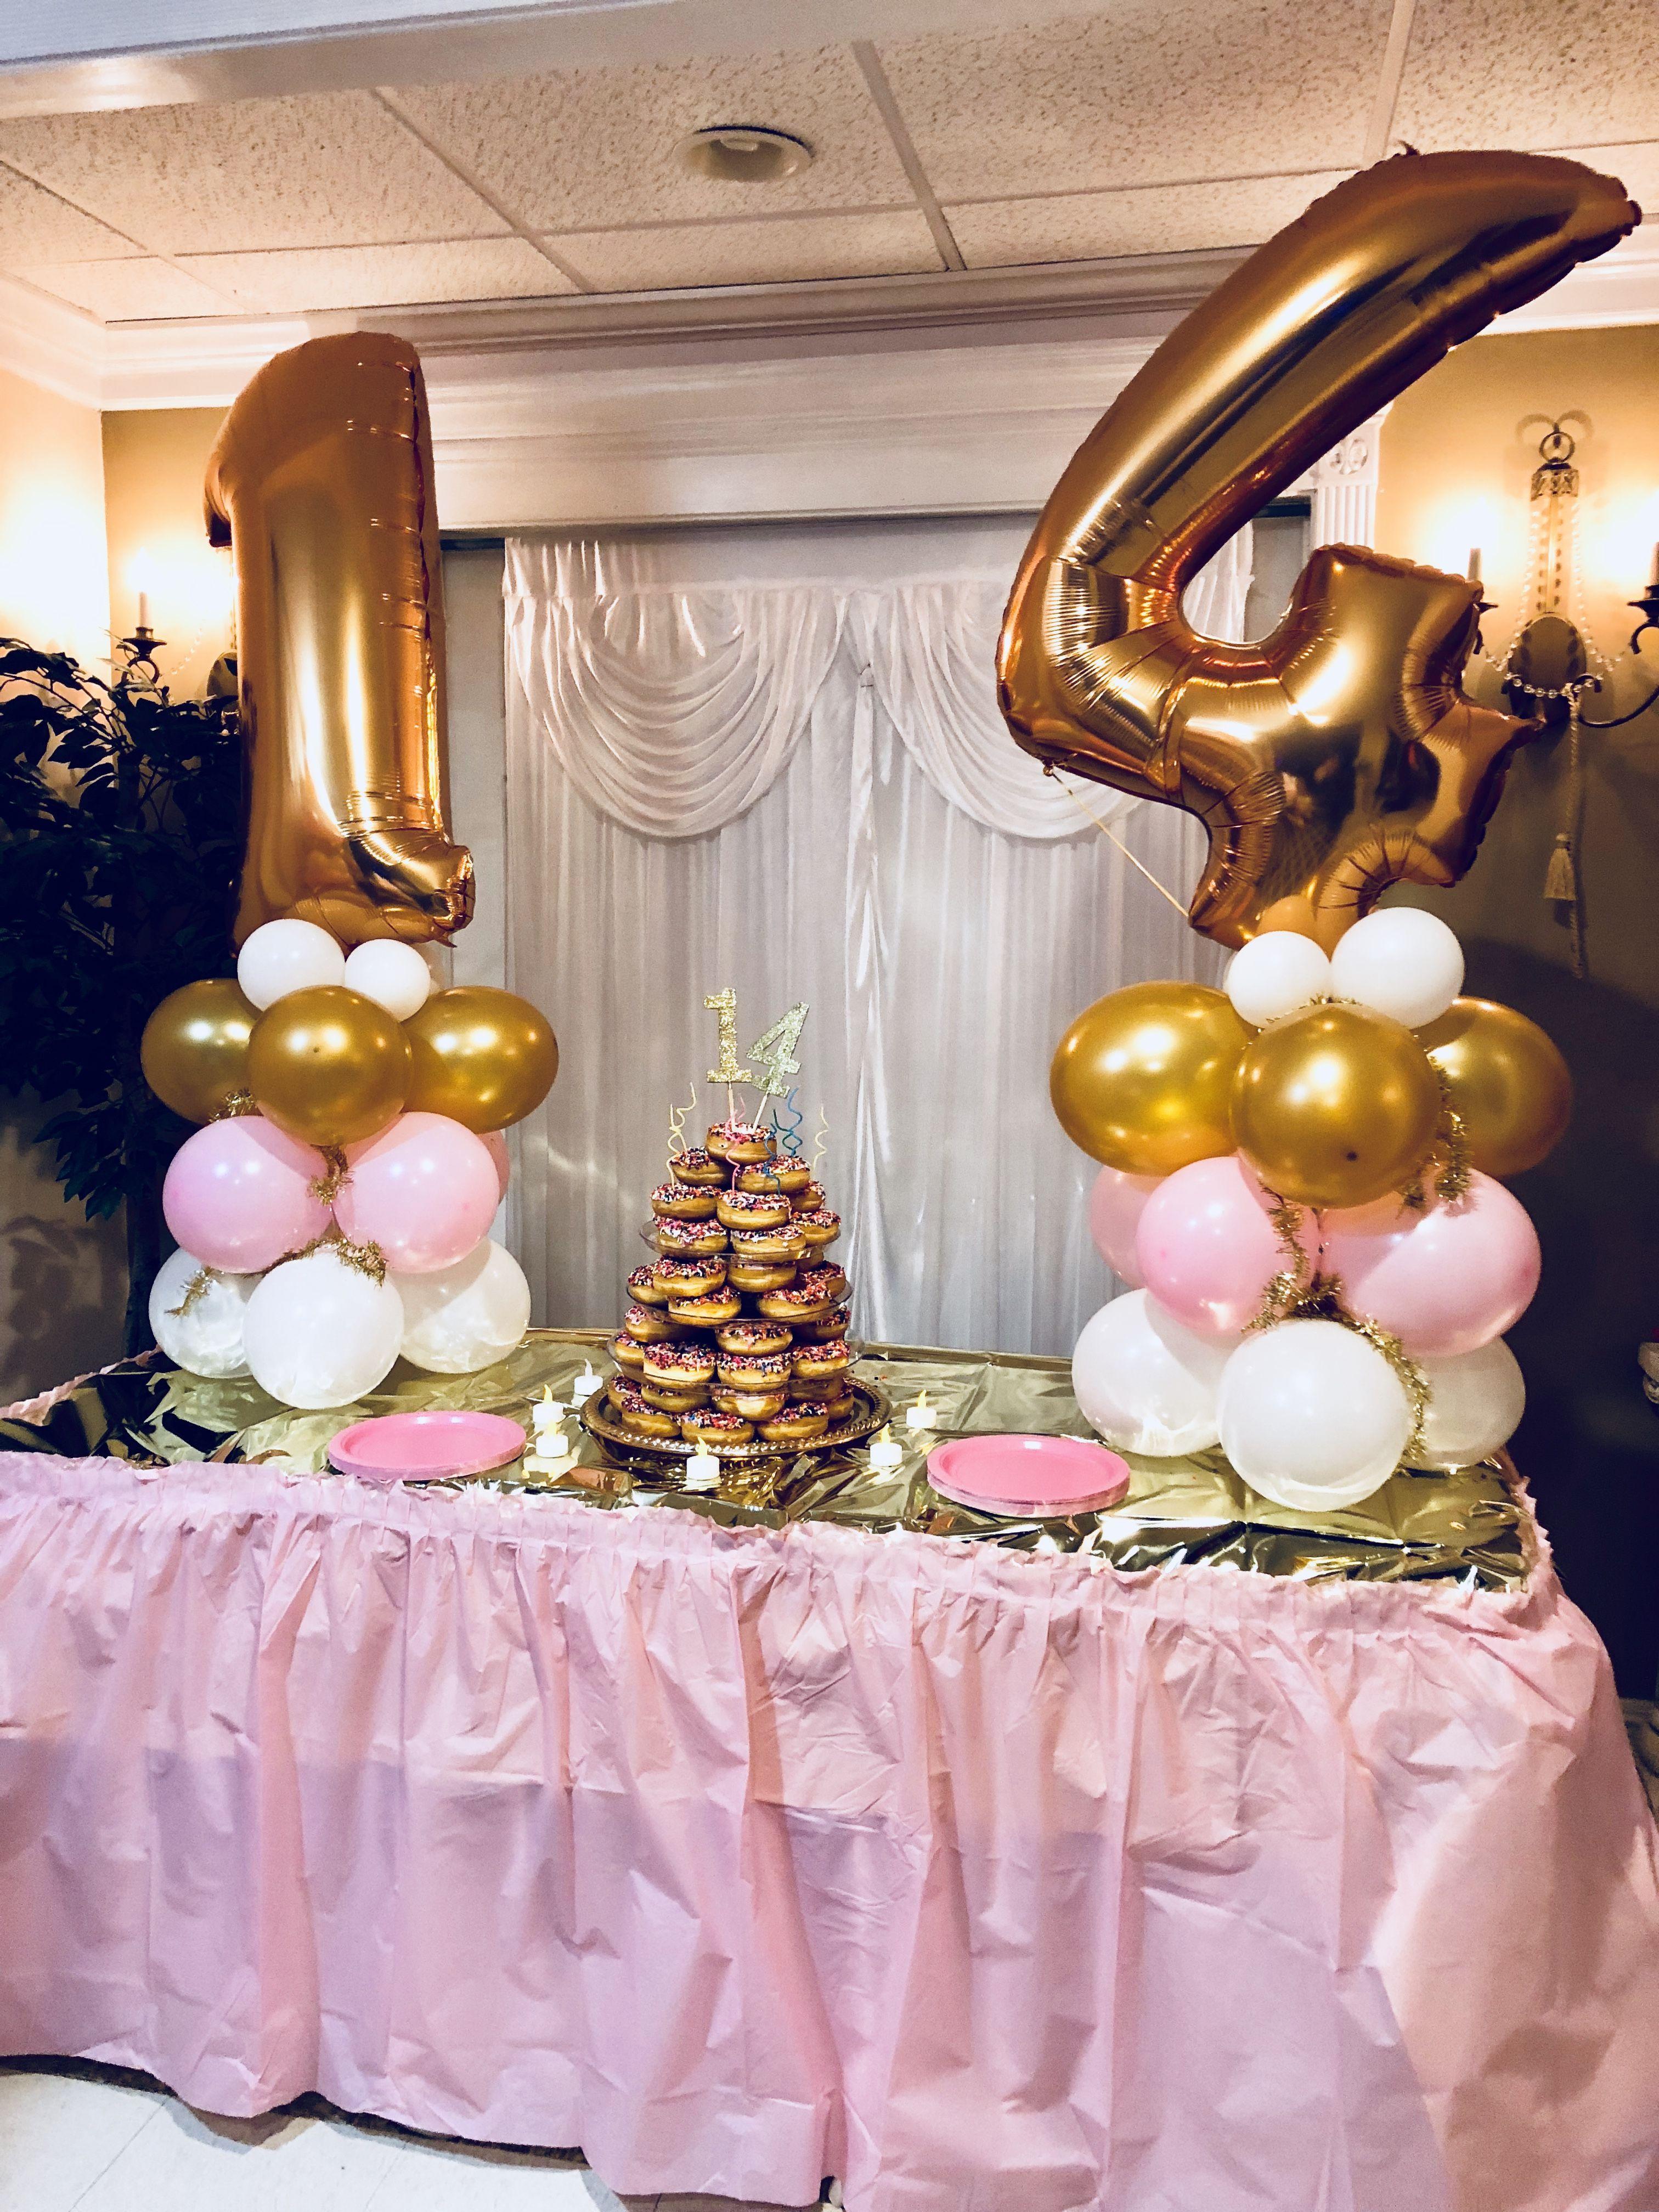 14Th Birthday Party Ideas Birthday party theme